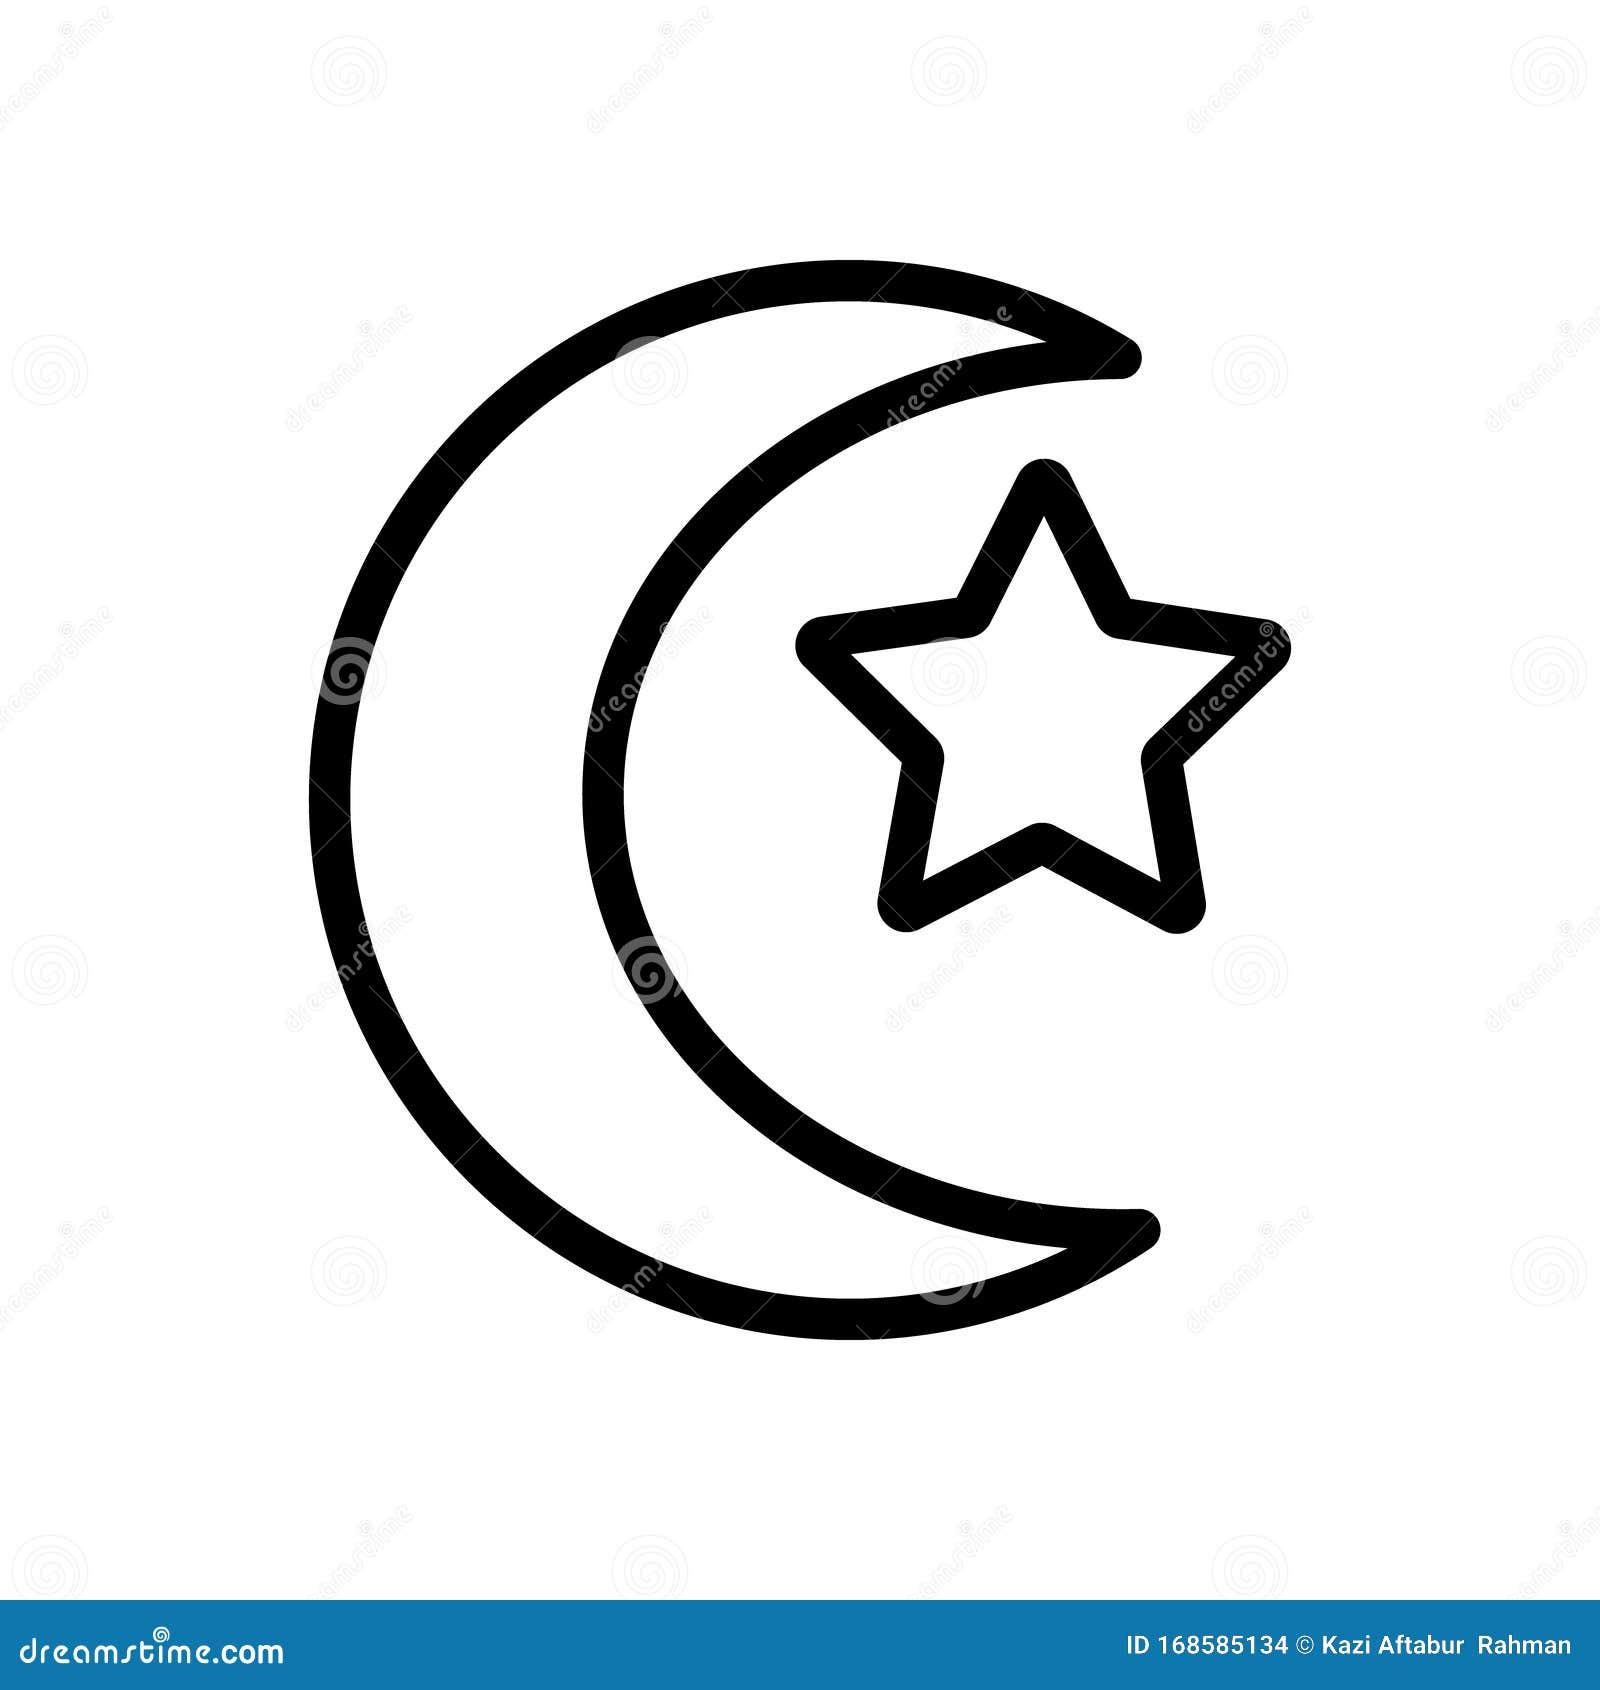 islam religion icon illustration design stock vector illustration of medical symbol 168585134 dreamstime com